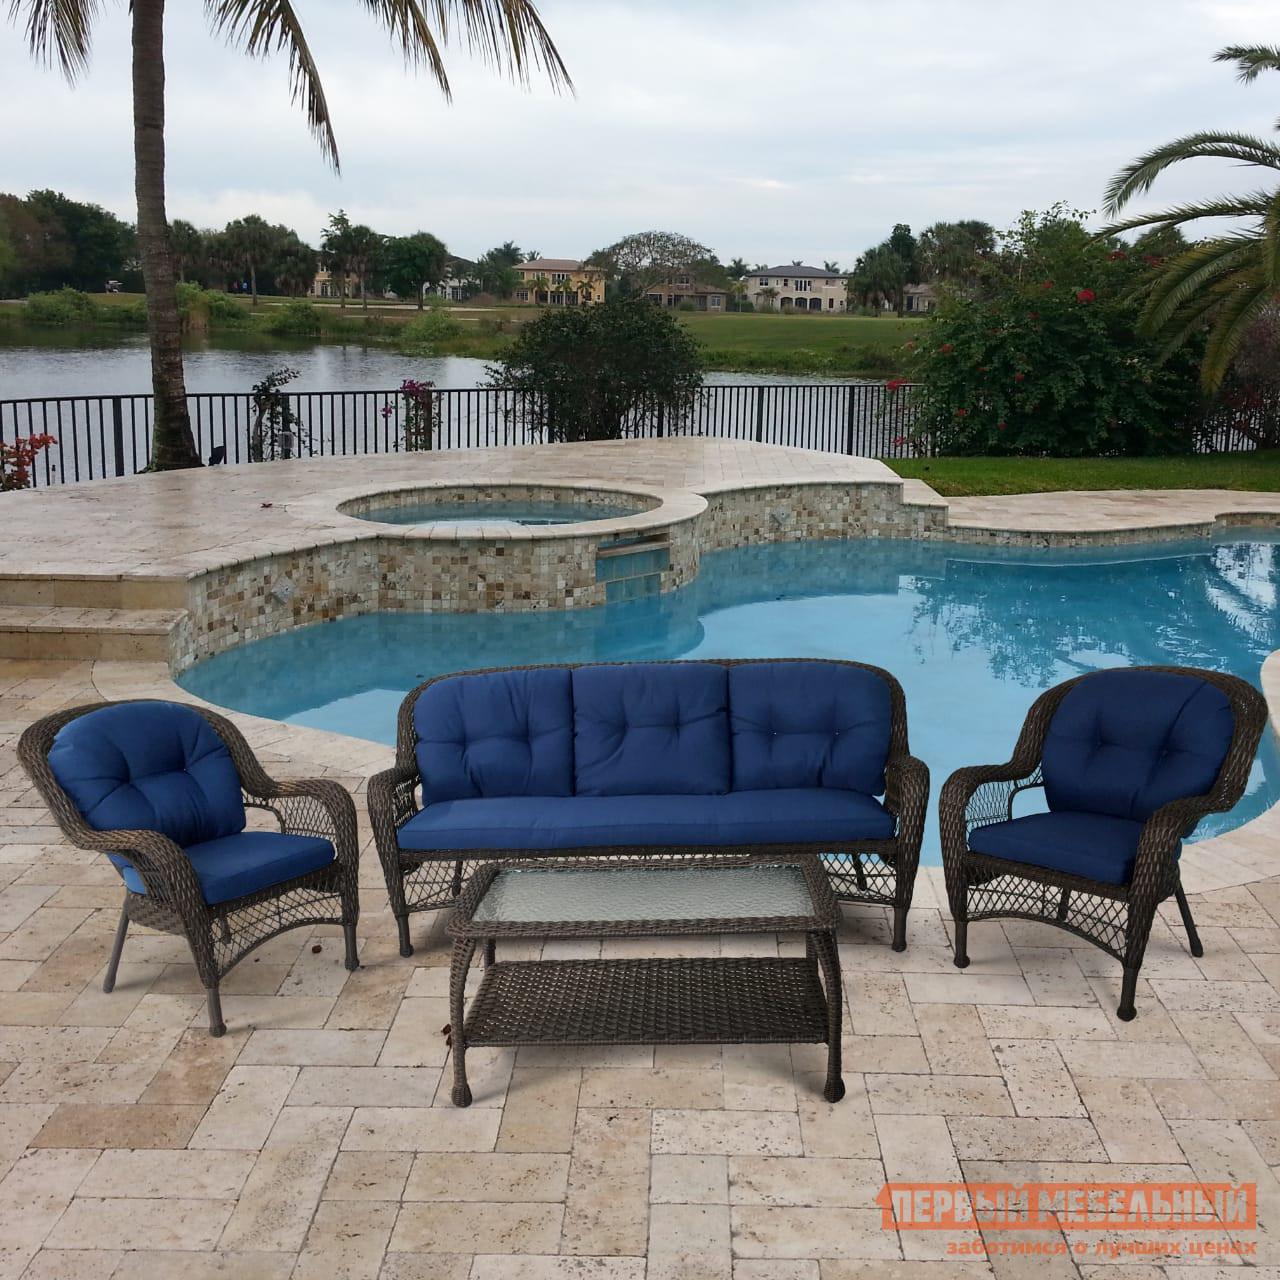 Комплект плетеной мебели Афина-мебель LV216 Brown/Beige Brown/Blue комплект плетеной мебели афина мебель afm 2017g